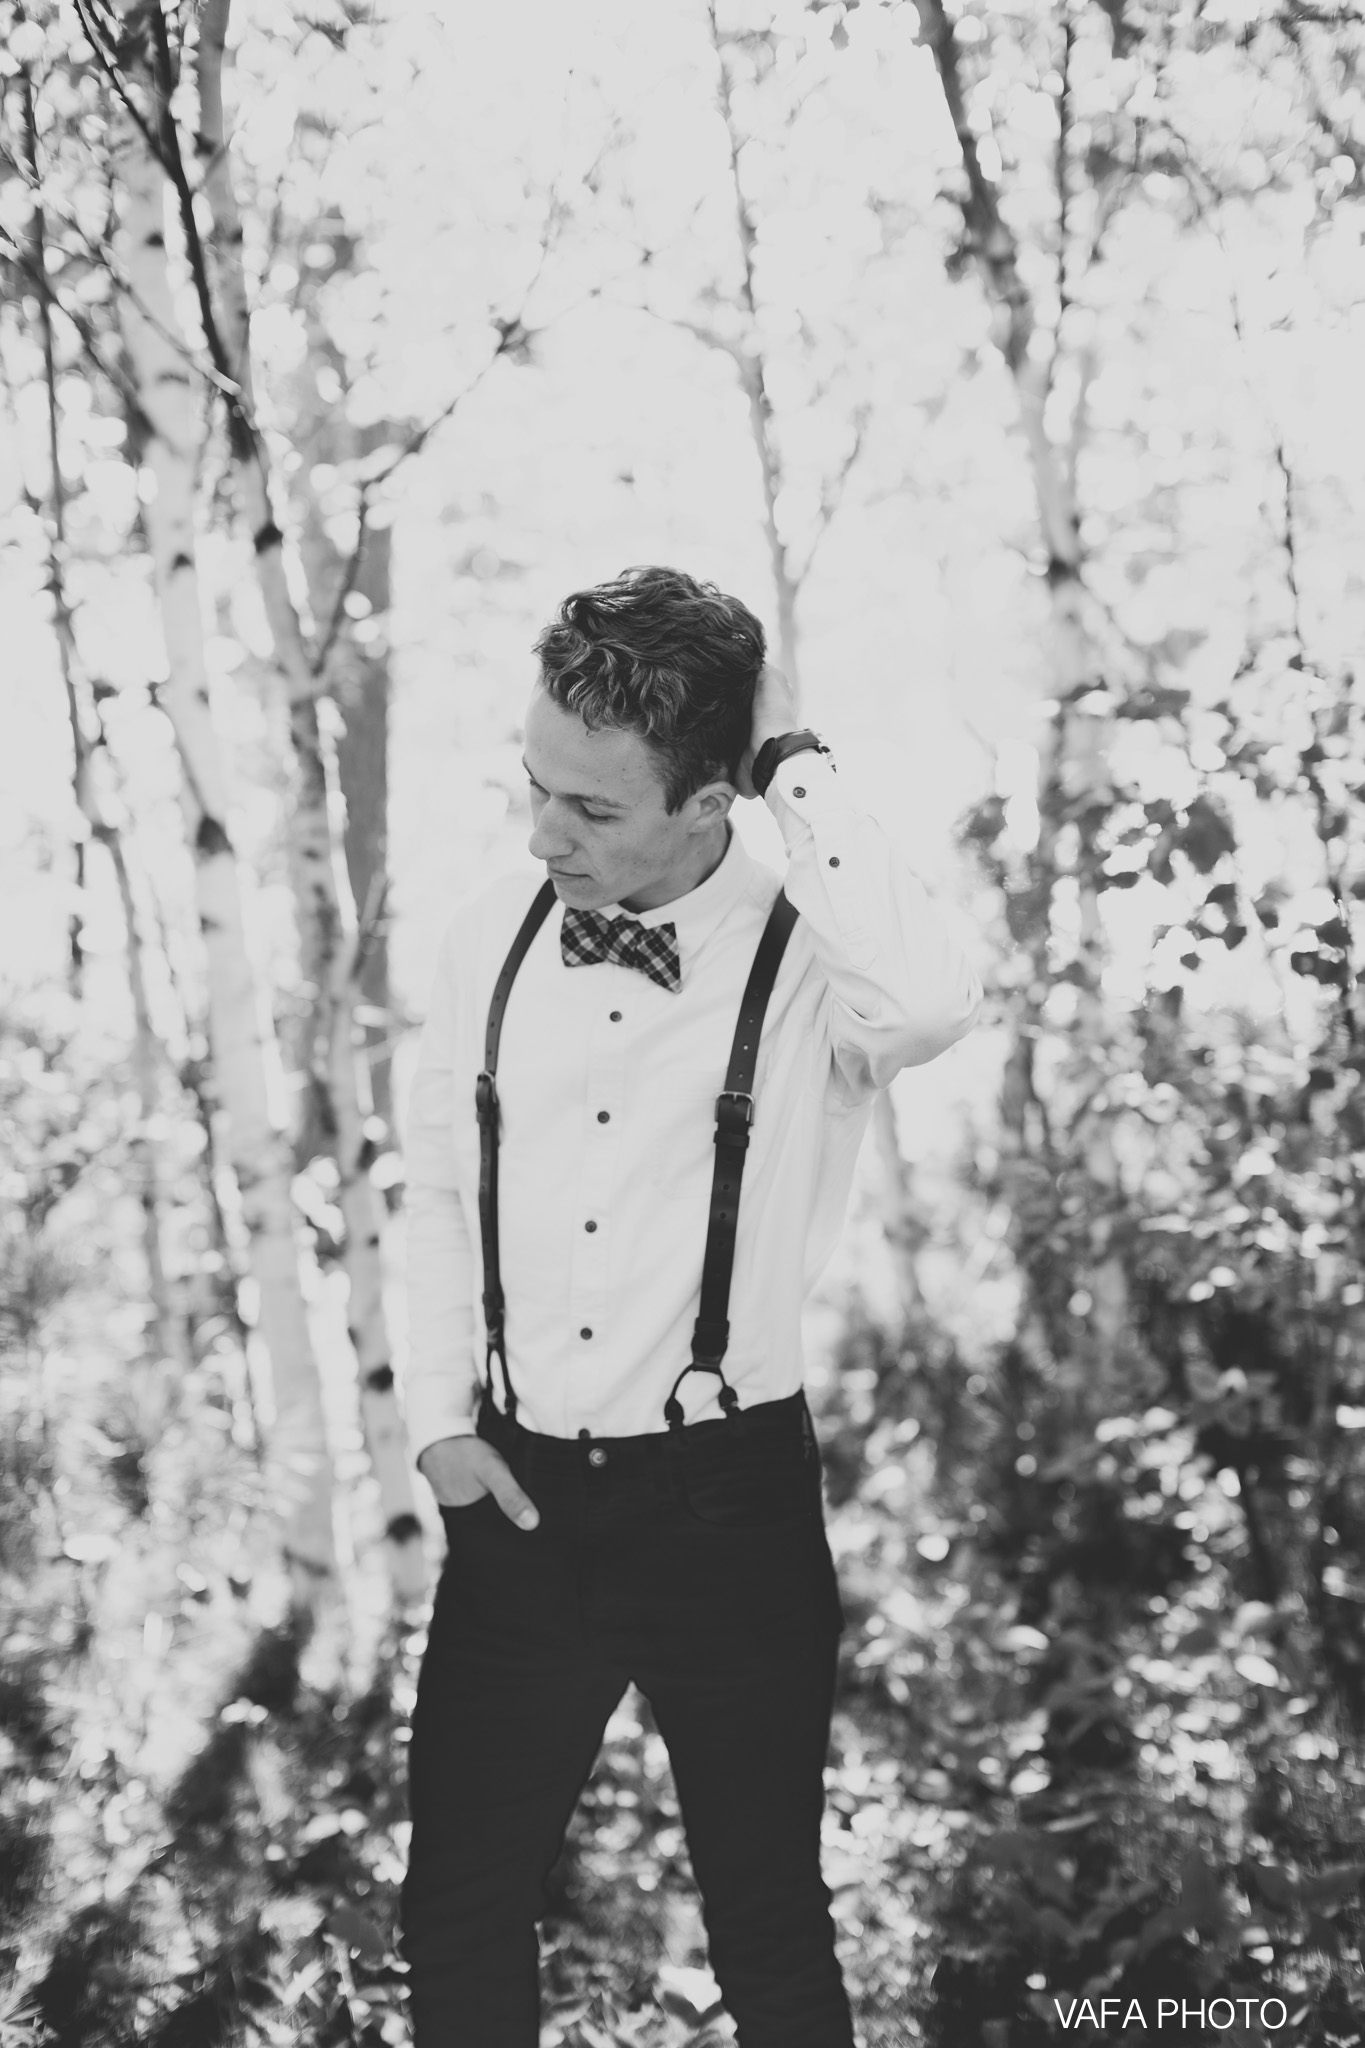 Hogback-Mountain-Wedding-Chelsea-Josh-Vafa-Photo-647.jpg